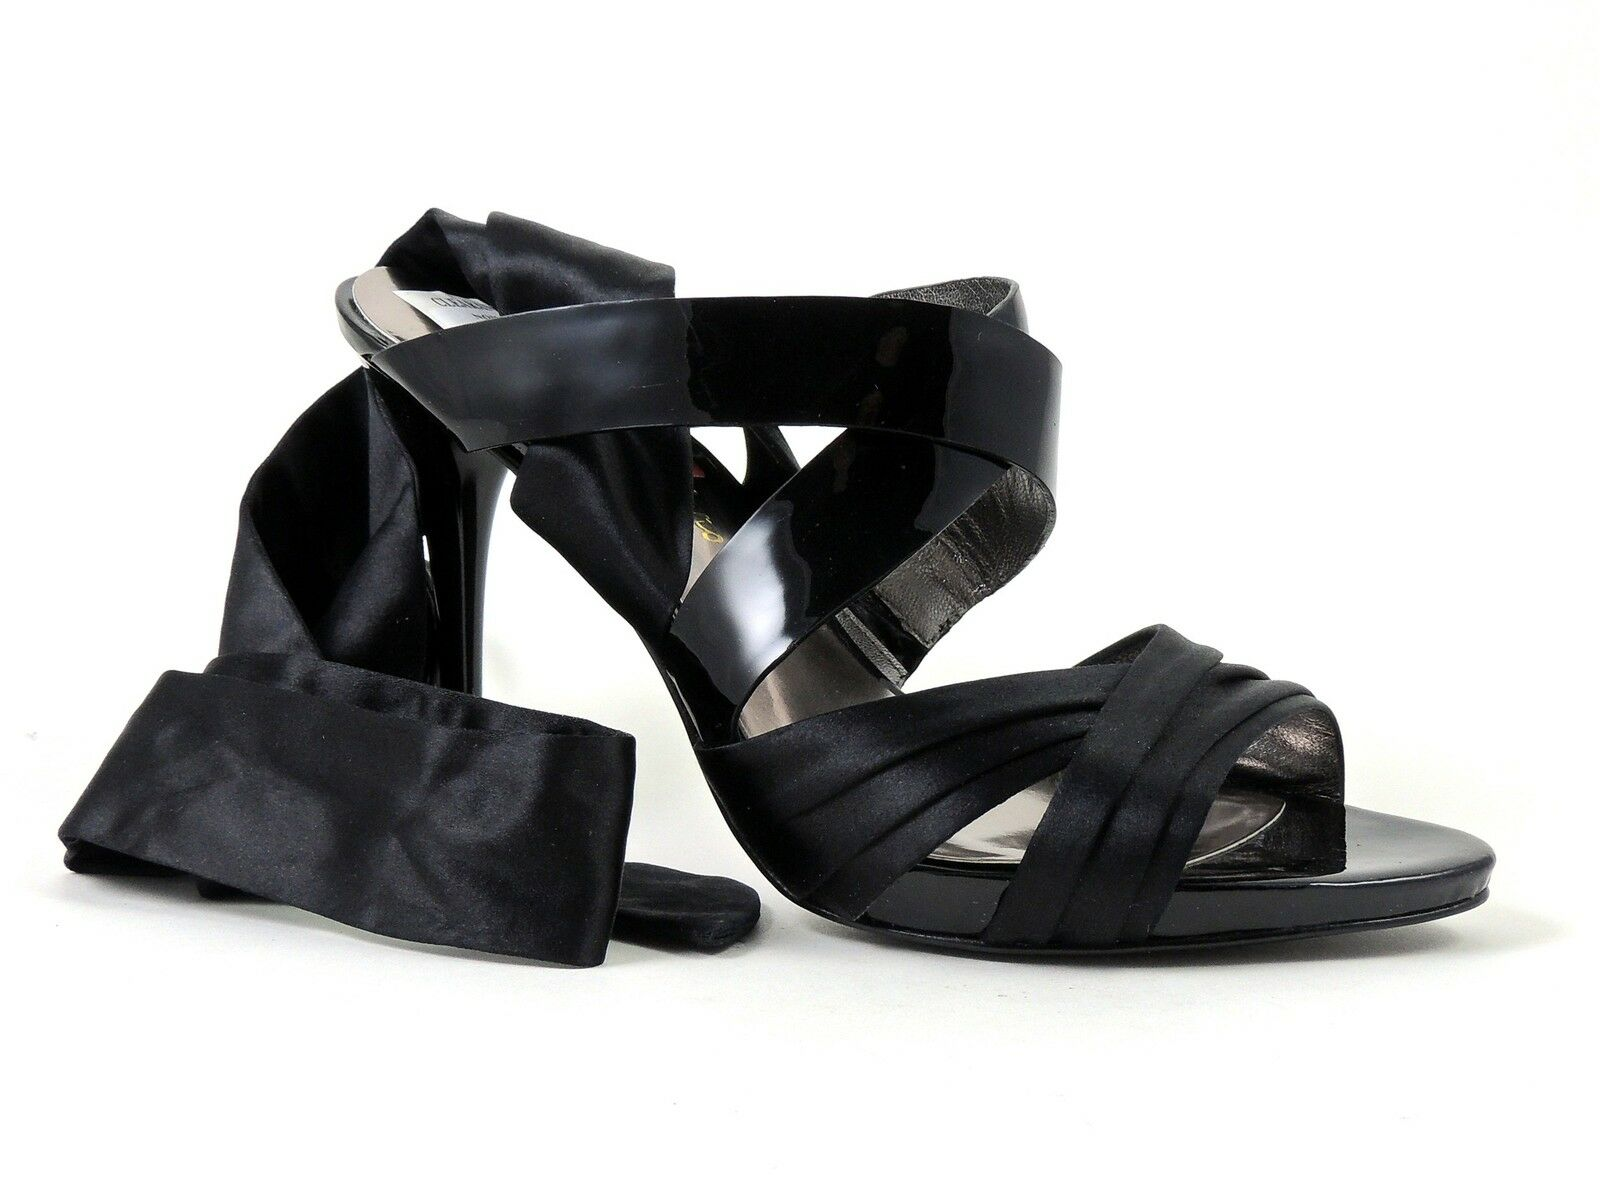 Katy Perry Women's The Annalie Heeled Sandal - Choose SZ/Color